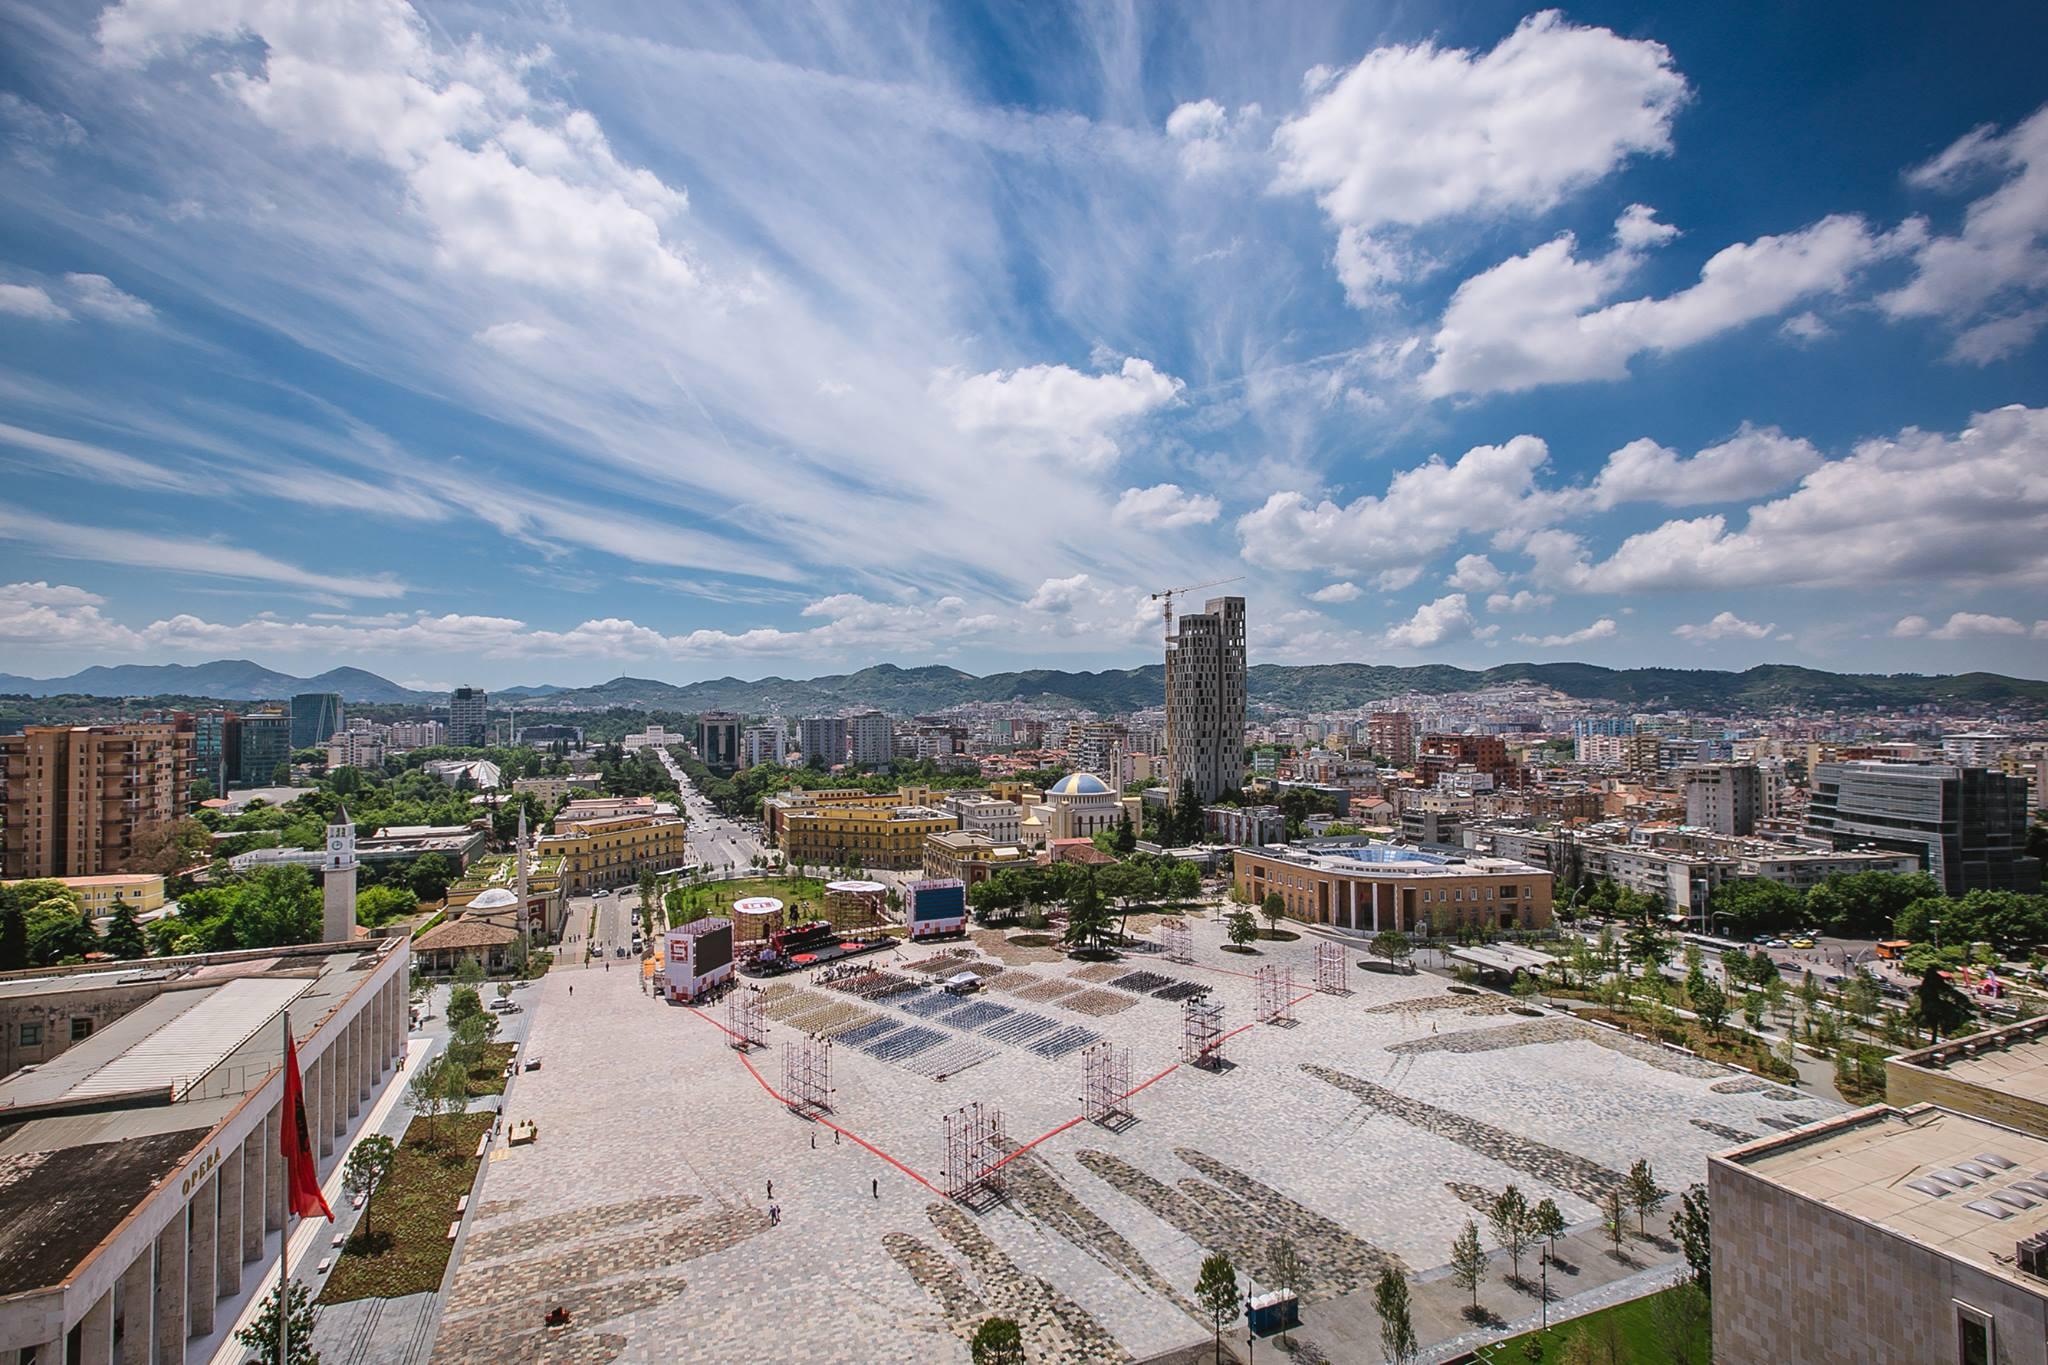 Piazza Scanderbeg, Tirana Albania European Prize for Urban Public Space 2018